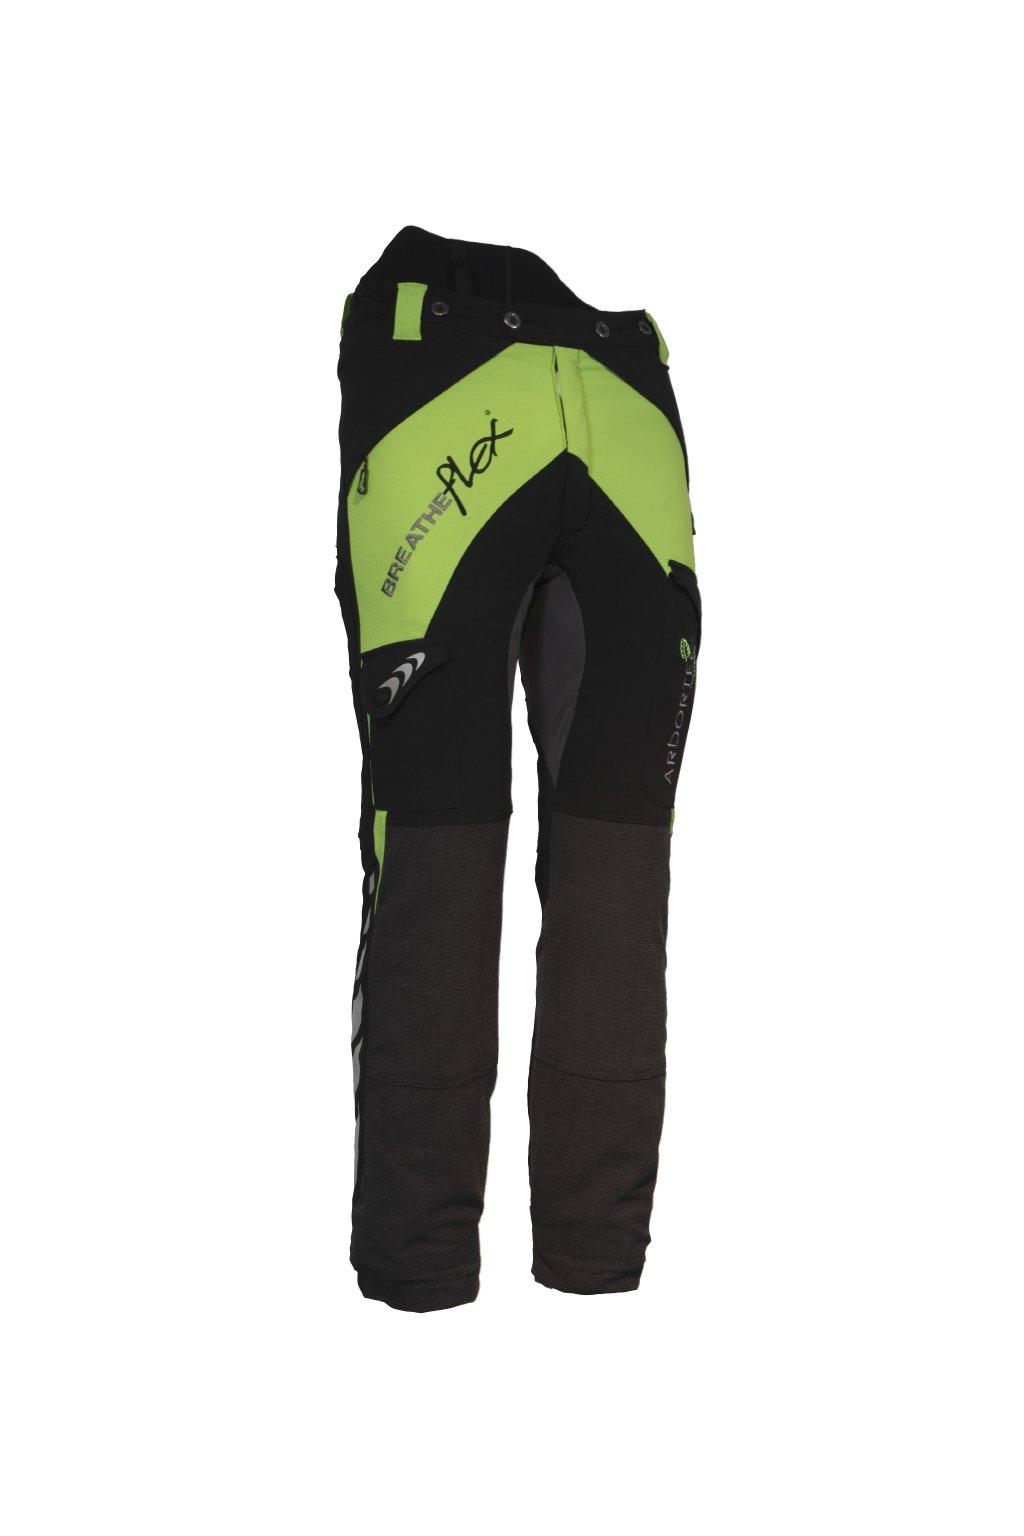 Protipořezové kalhoty Breatheflex zelené Class3/TypeC Reg